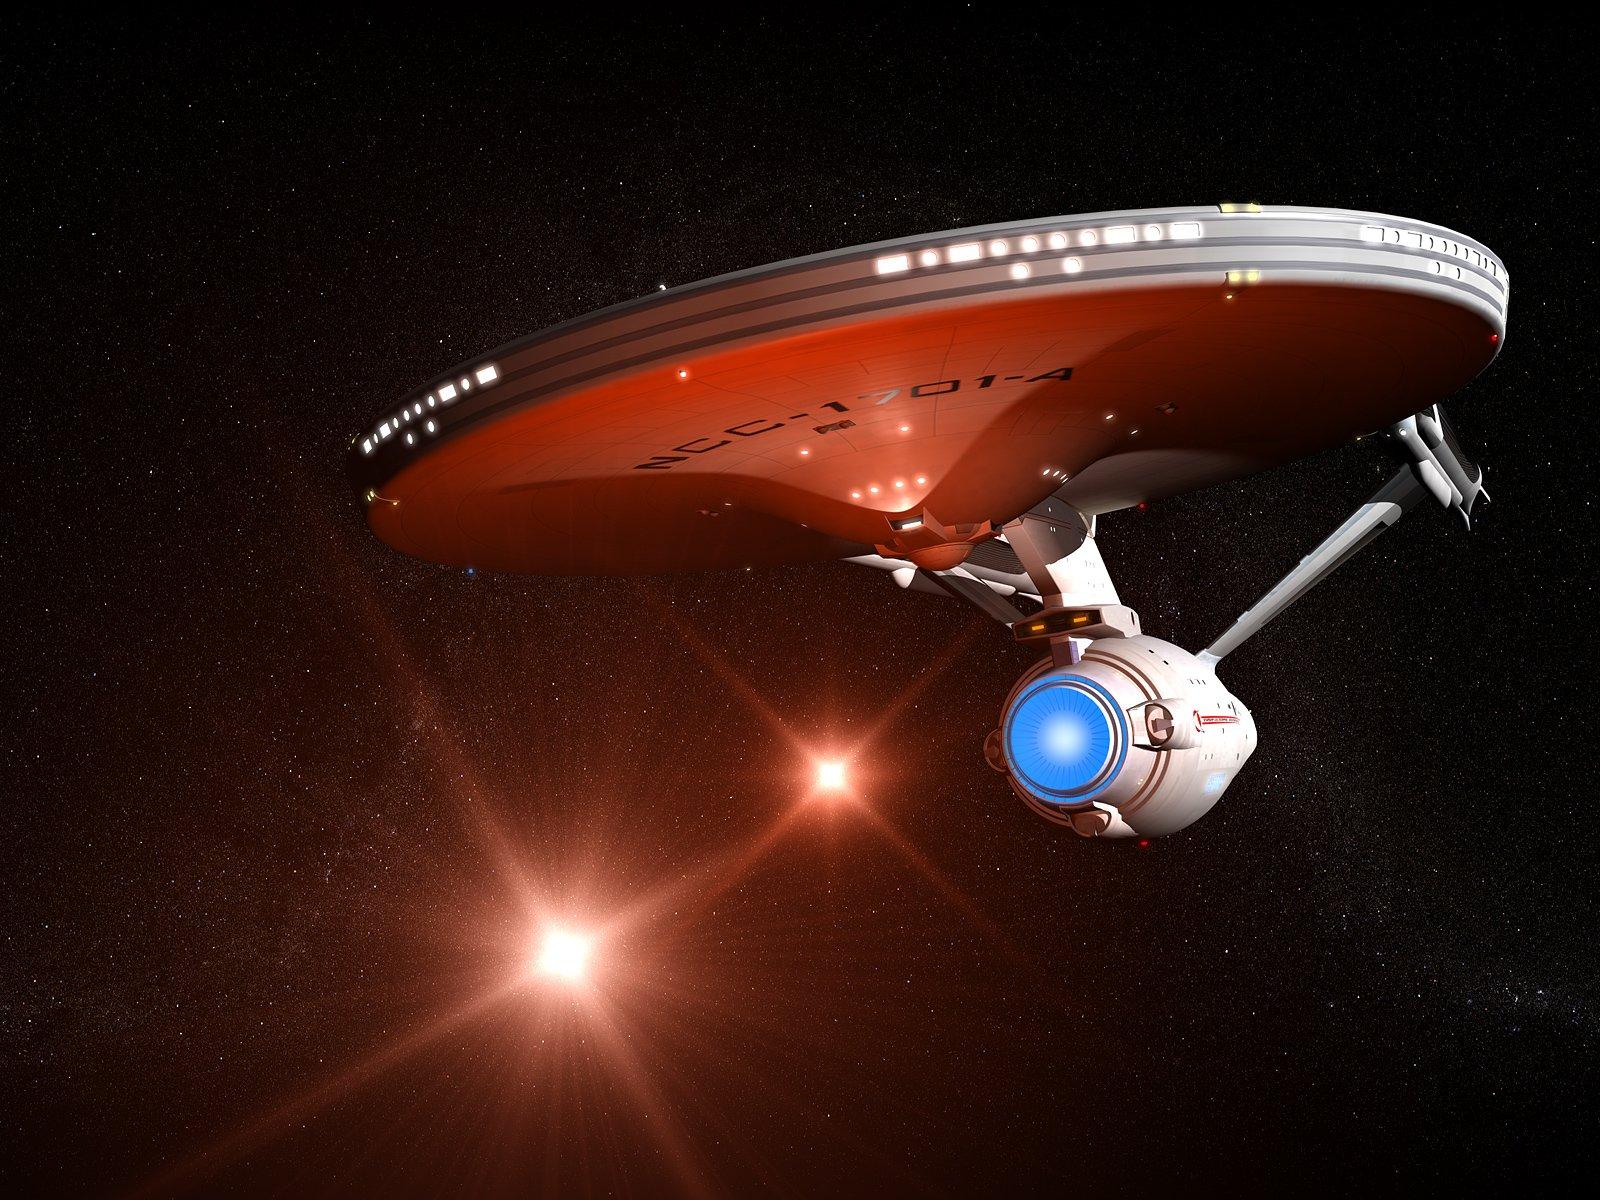 Starship USS Enterprise 1701A Star Trek desktop wallpaper size 1600x1200